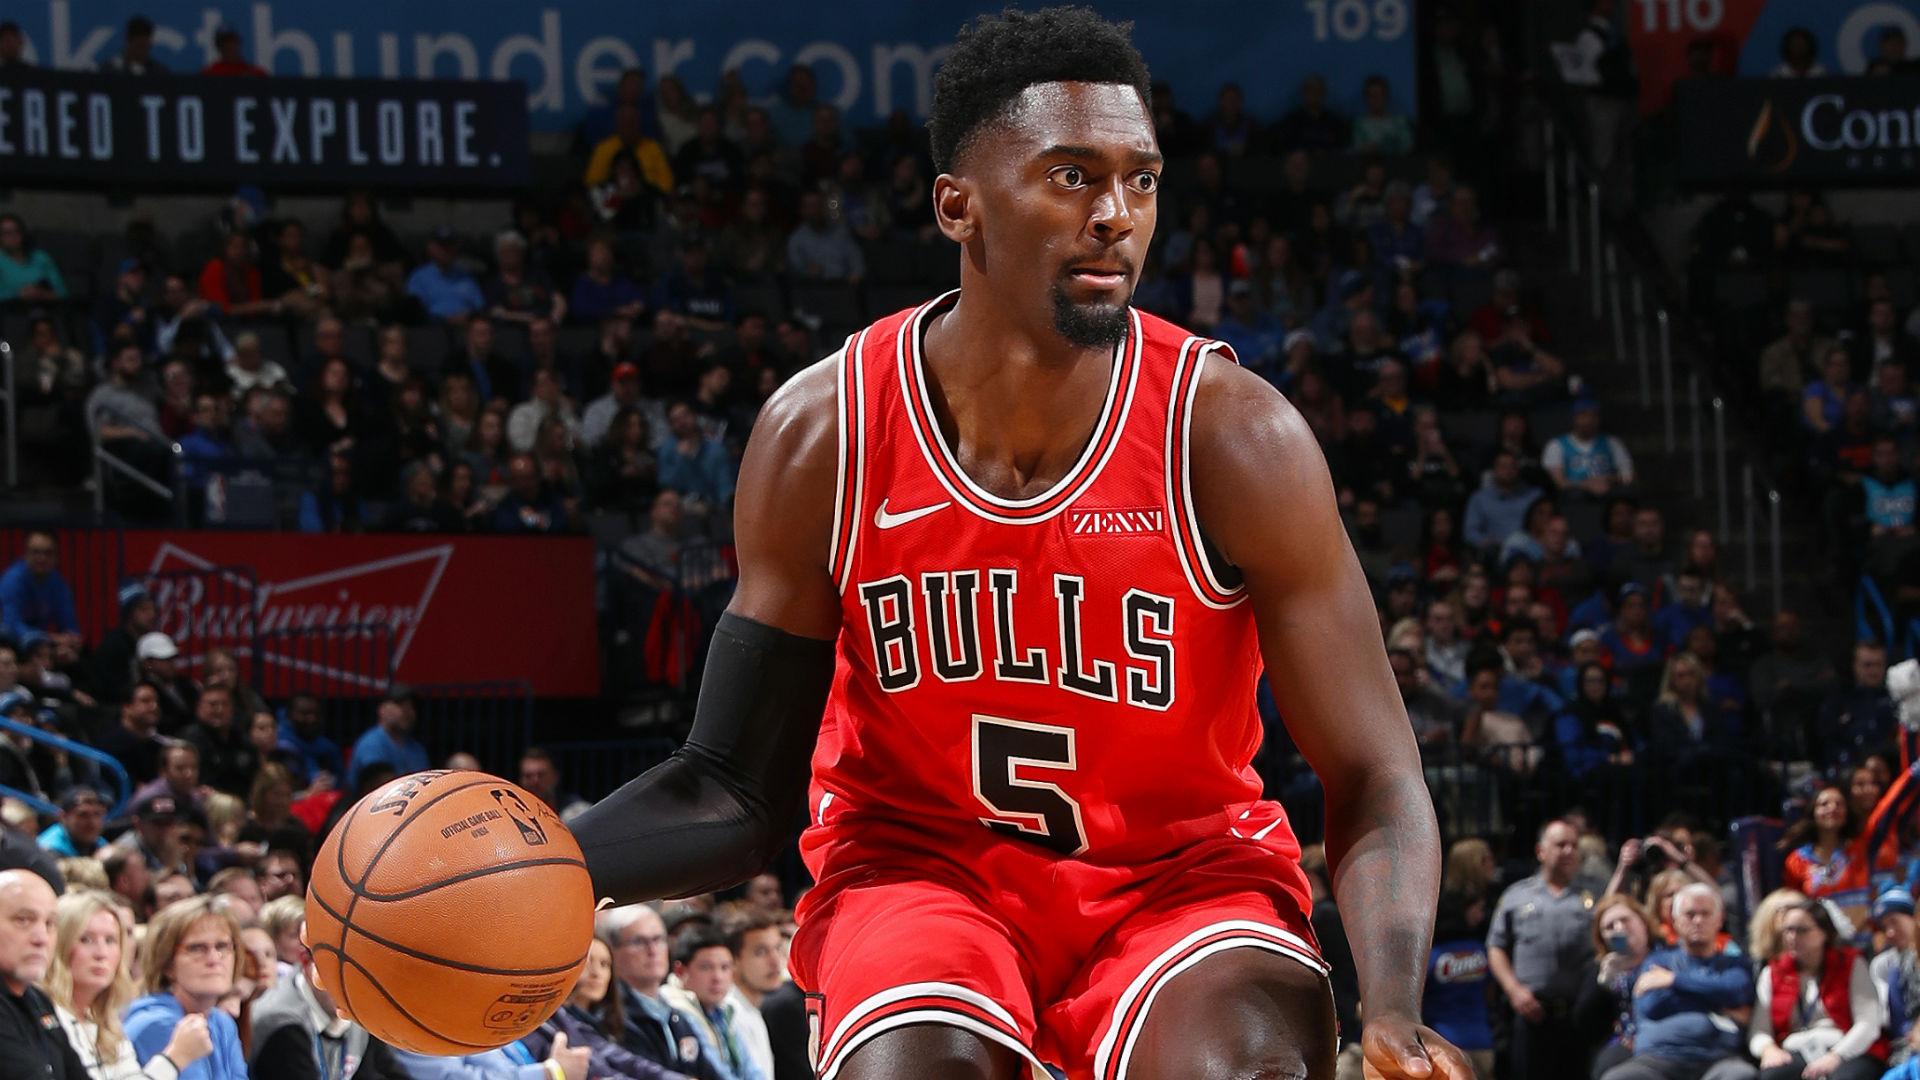 Sigue la mala suerte en Chicago Bulls: Bobby Portis, 2-4 ...